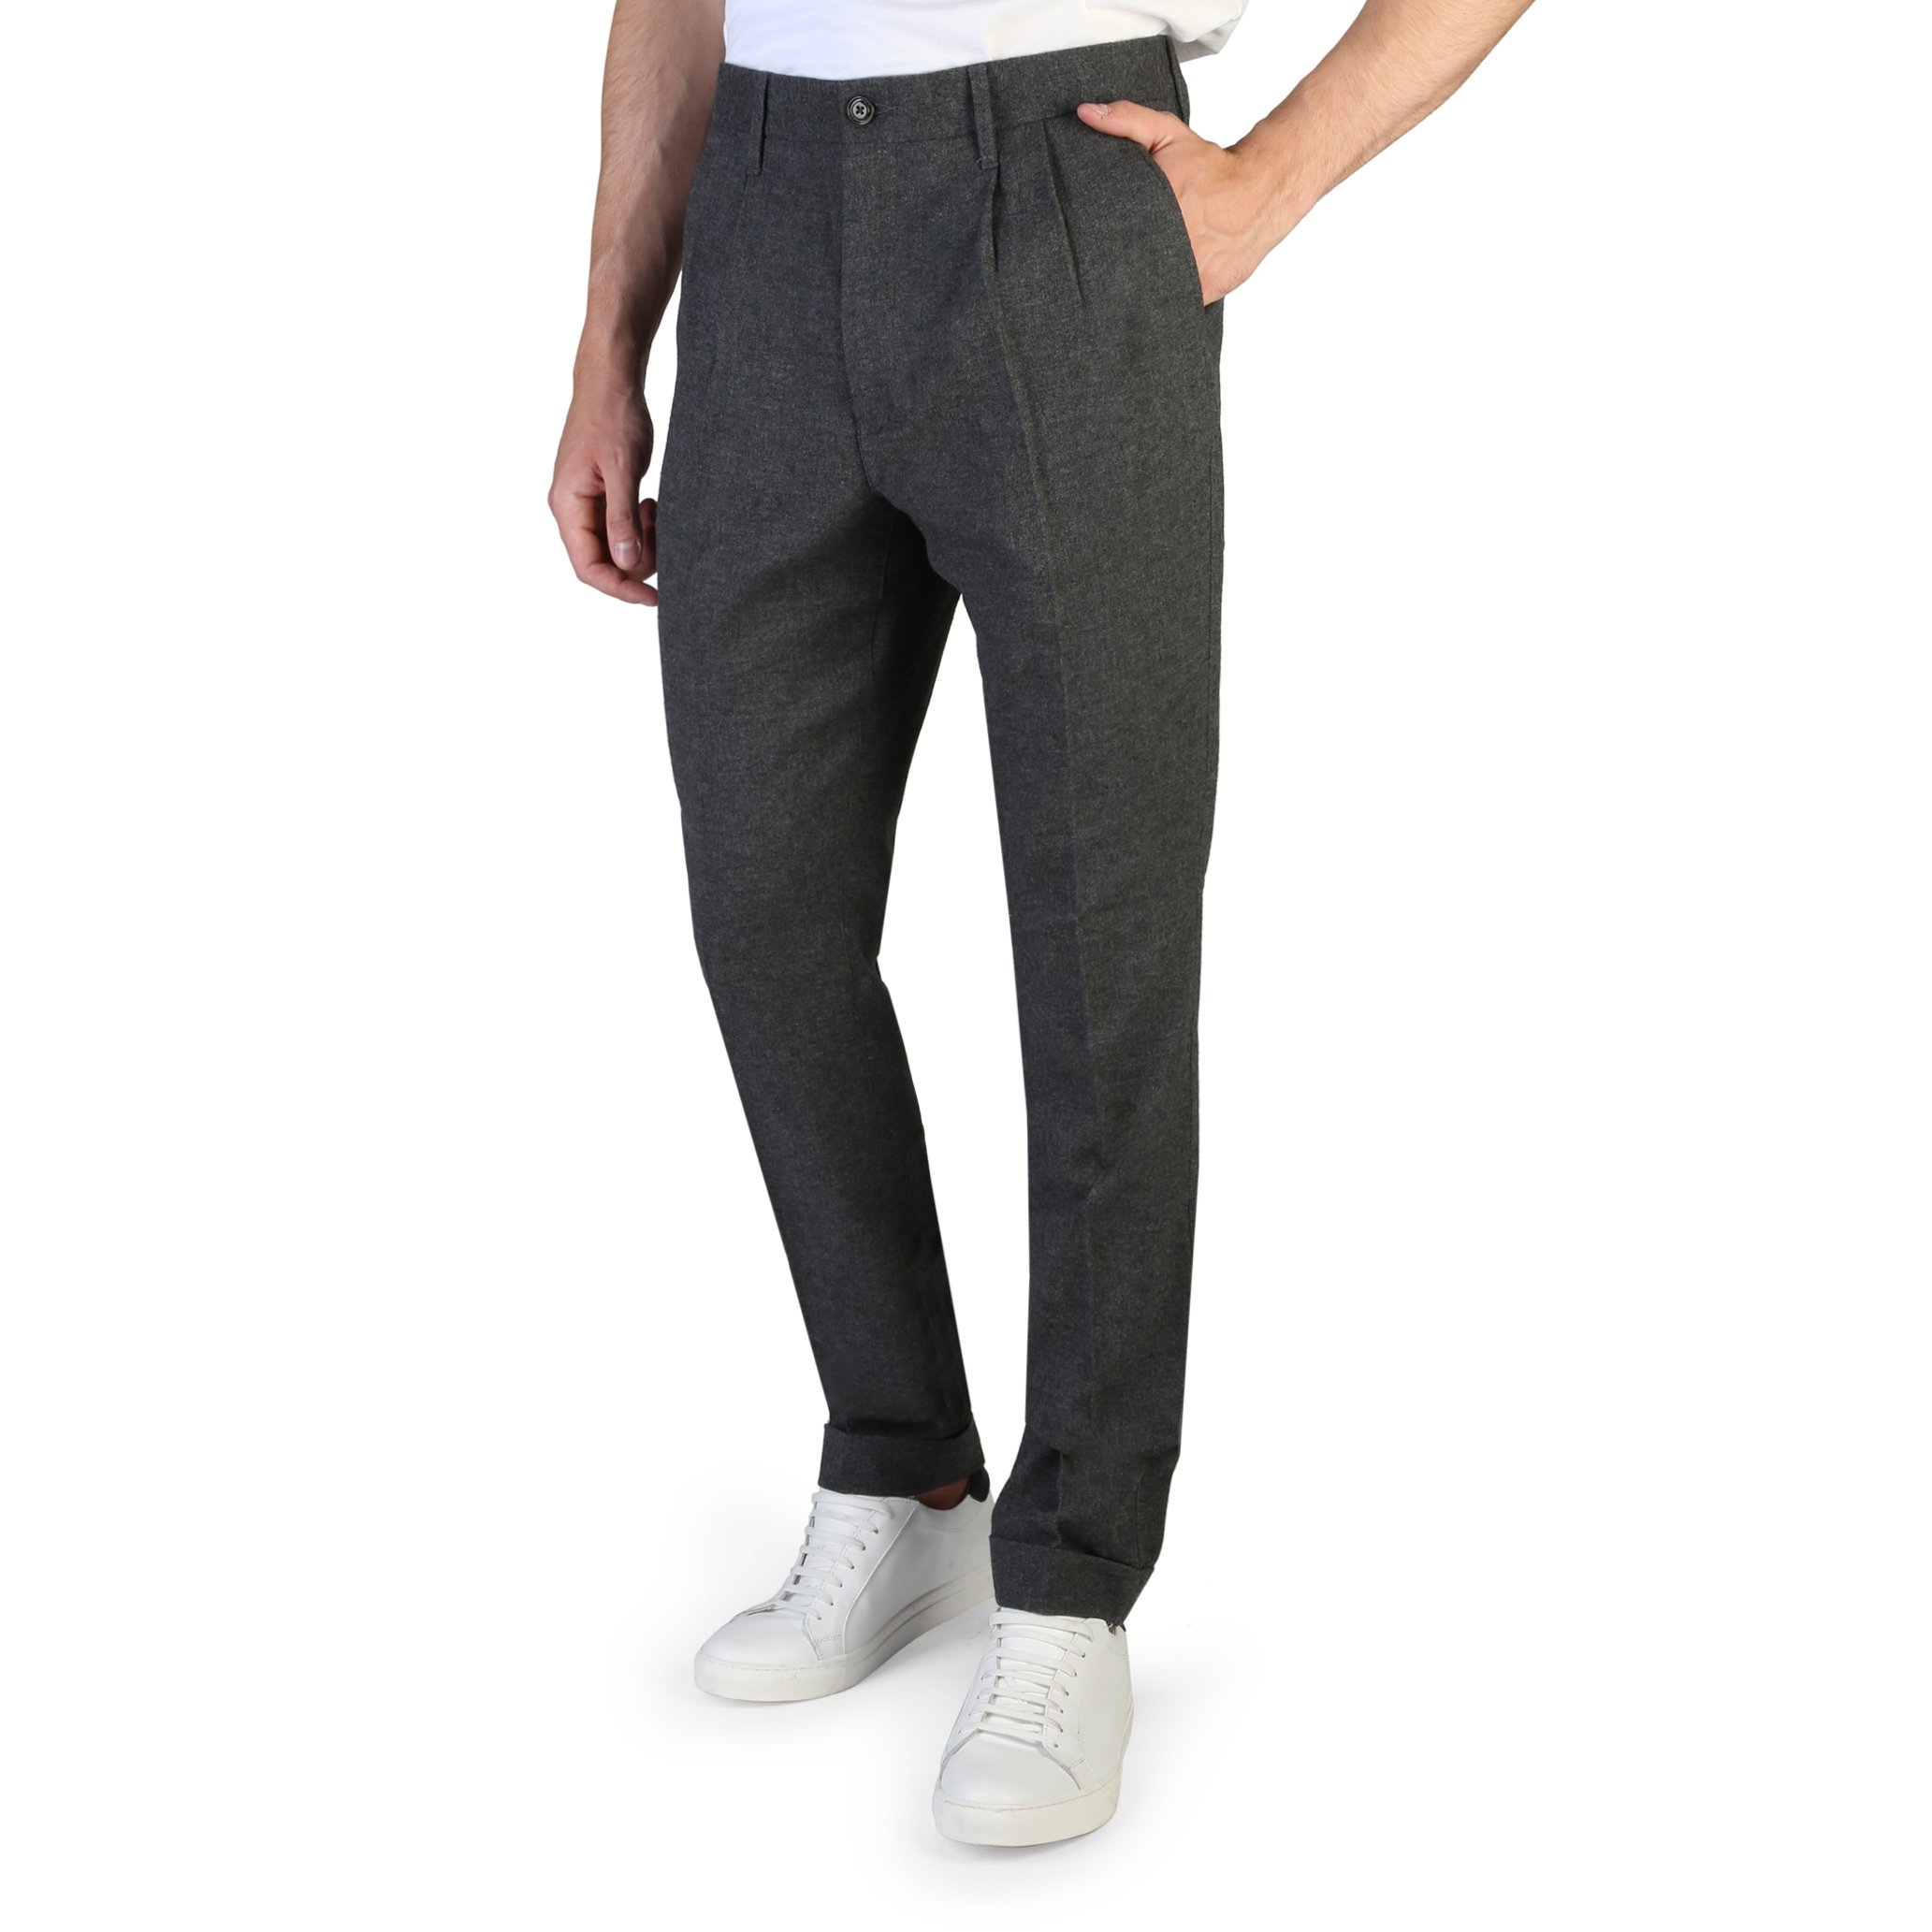 Tommy Hilfiger Men's Trouser Grey MW0MW08475 - grey-1 40